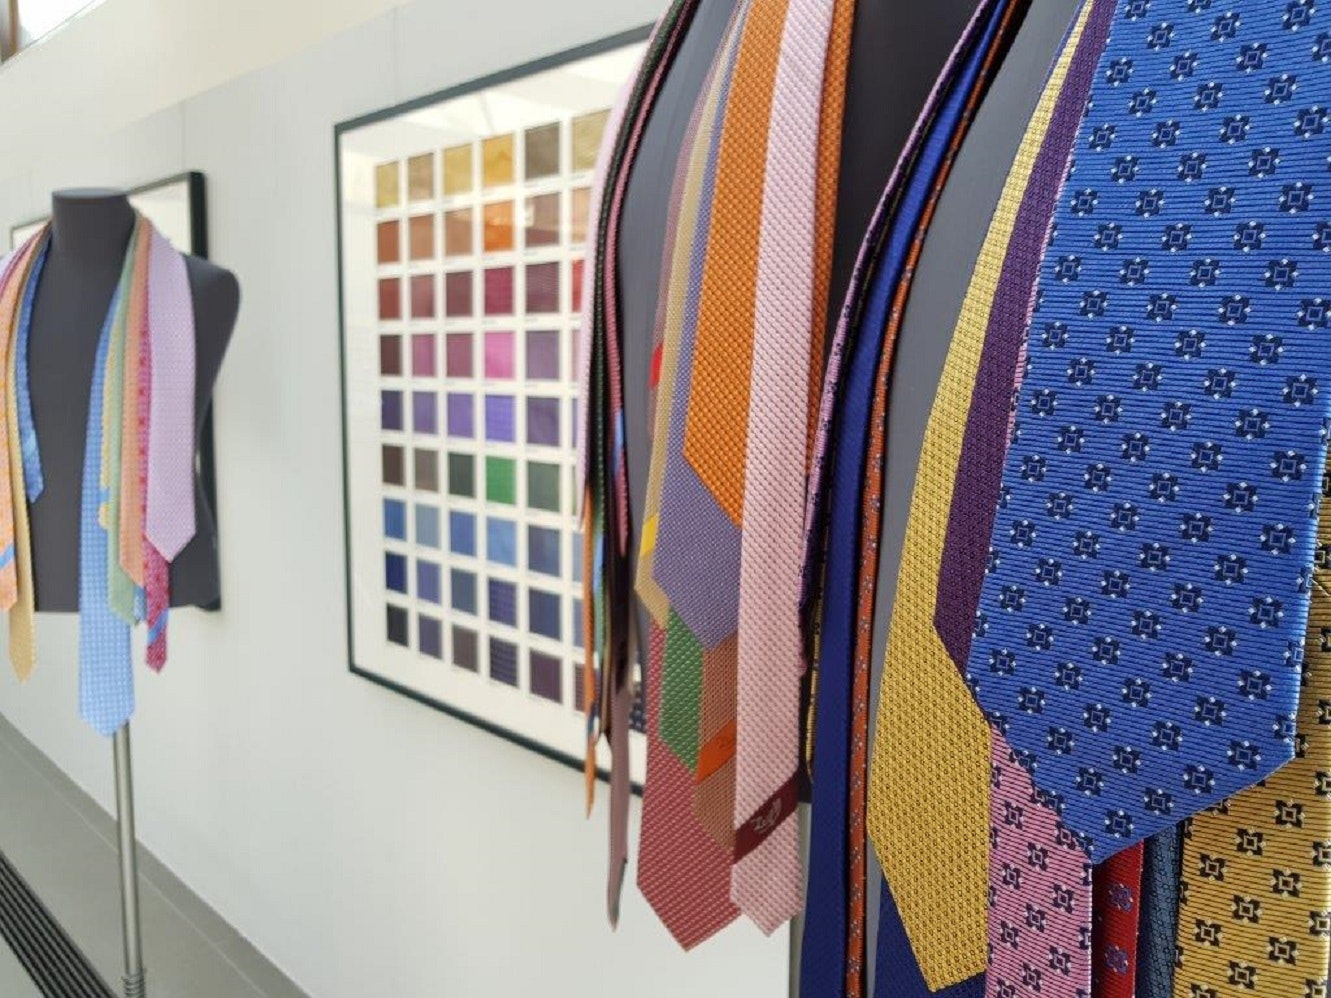 Casa Zegna, progetto creativo cravatteria, CASA ZEGNA, TRIVERO (BI )